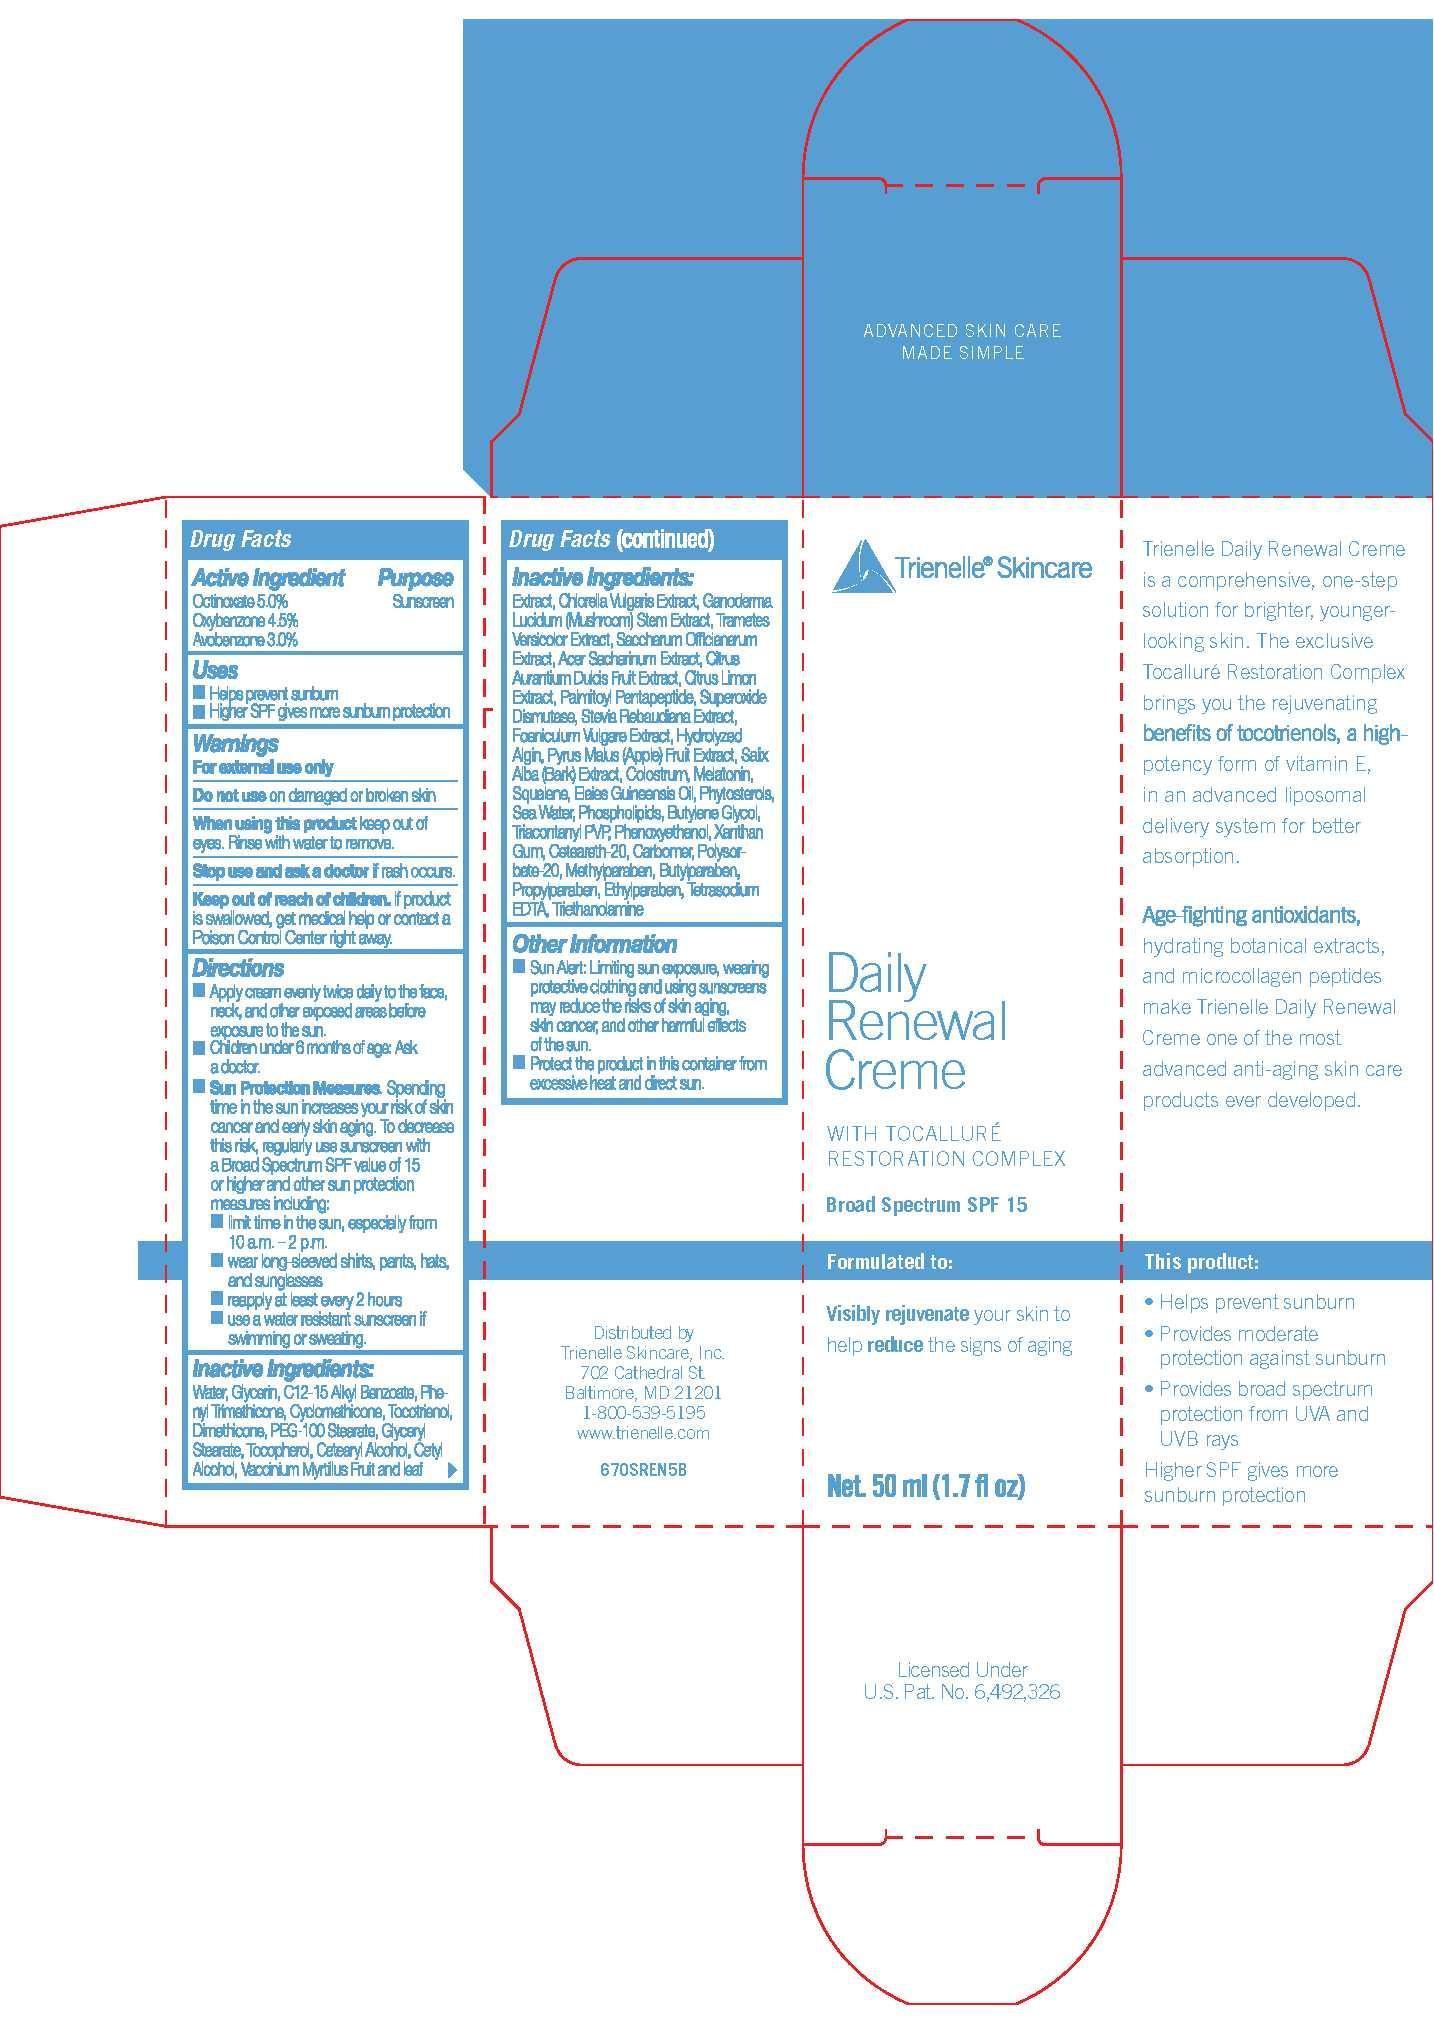 Trienelle Skincare Daily Renewal Creme With Tocallure Restoration Complex Broad Spectrum Spf 15 (Octinoxate 5%, Oxybezone 4.5%, Avobenzone 3%) Cream [Newmarket Health Products Llc]